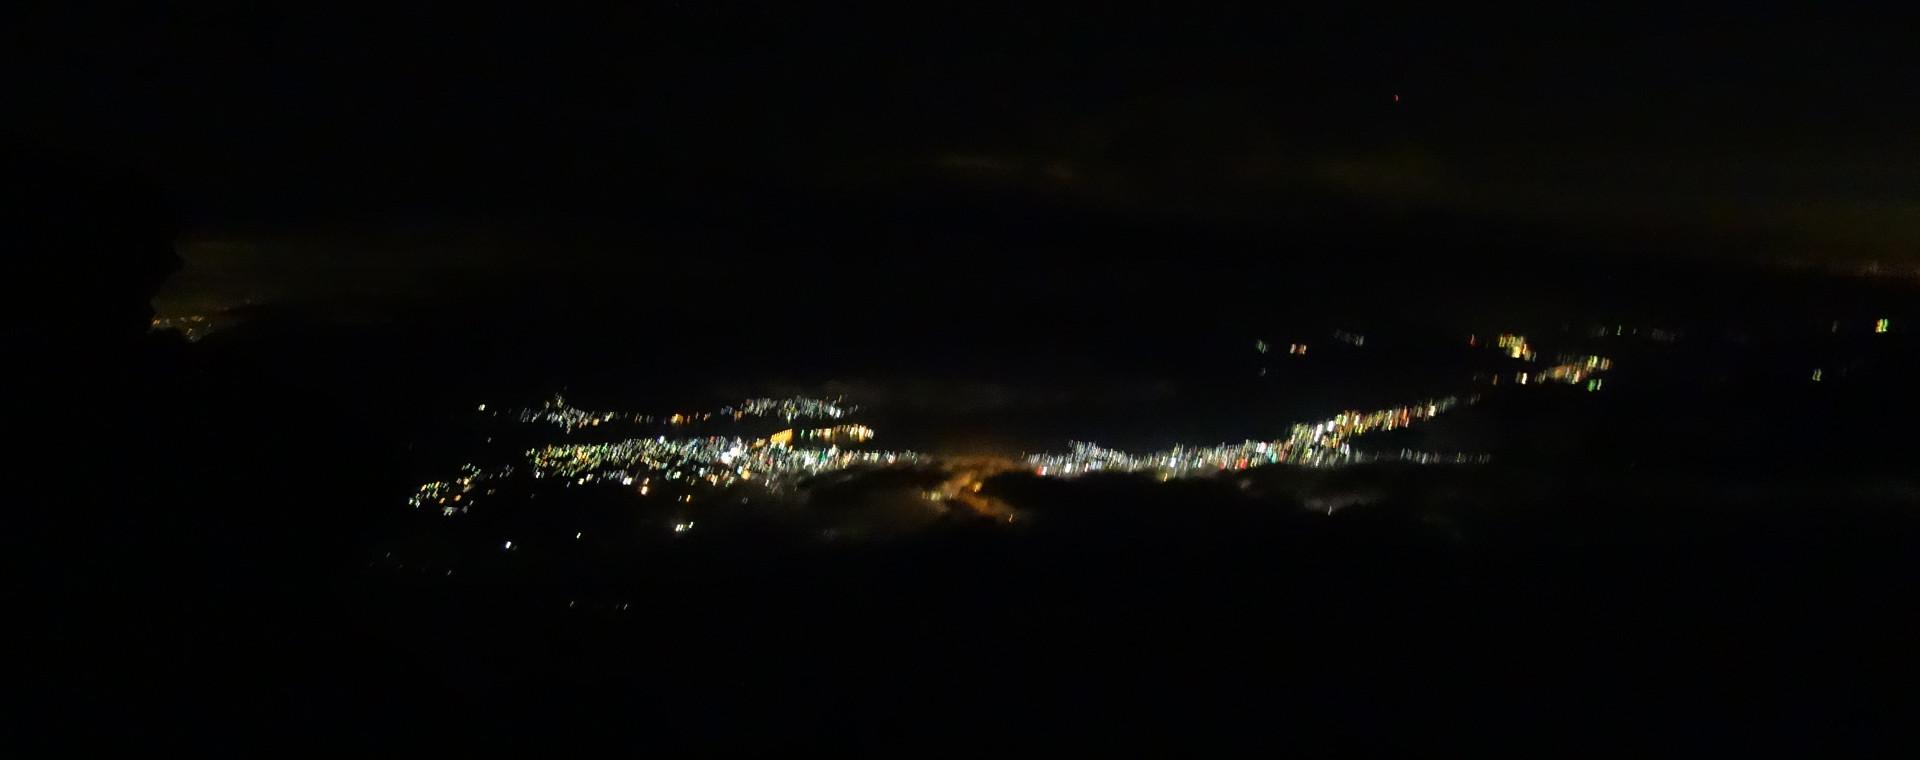 20140806 184101 fujisan nightview